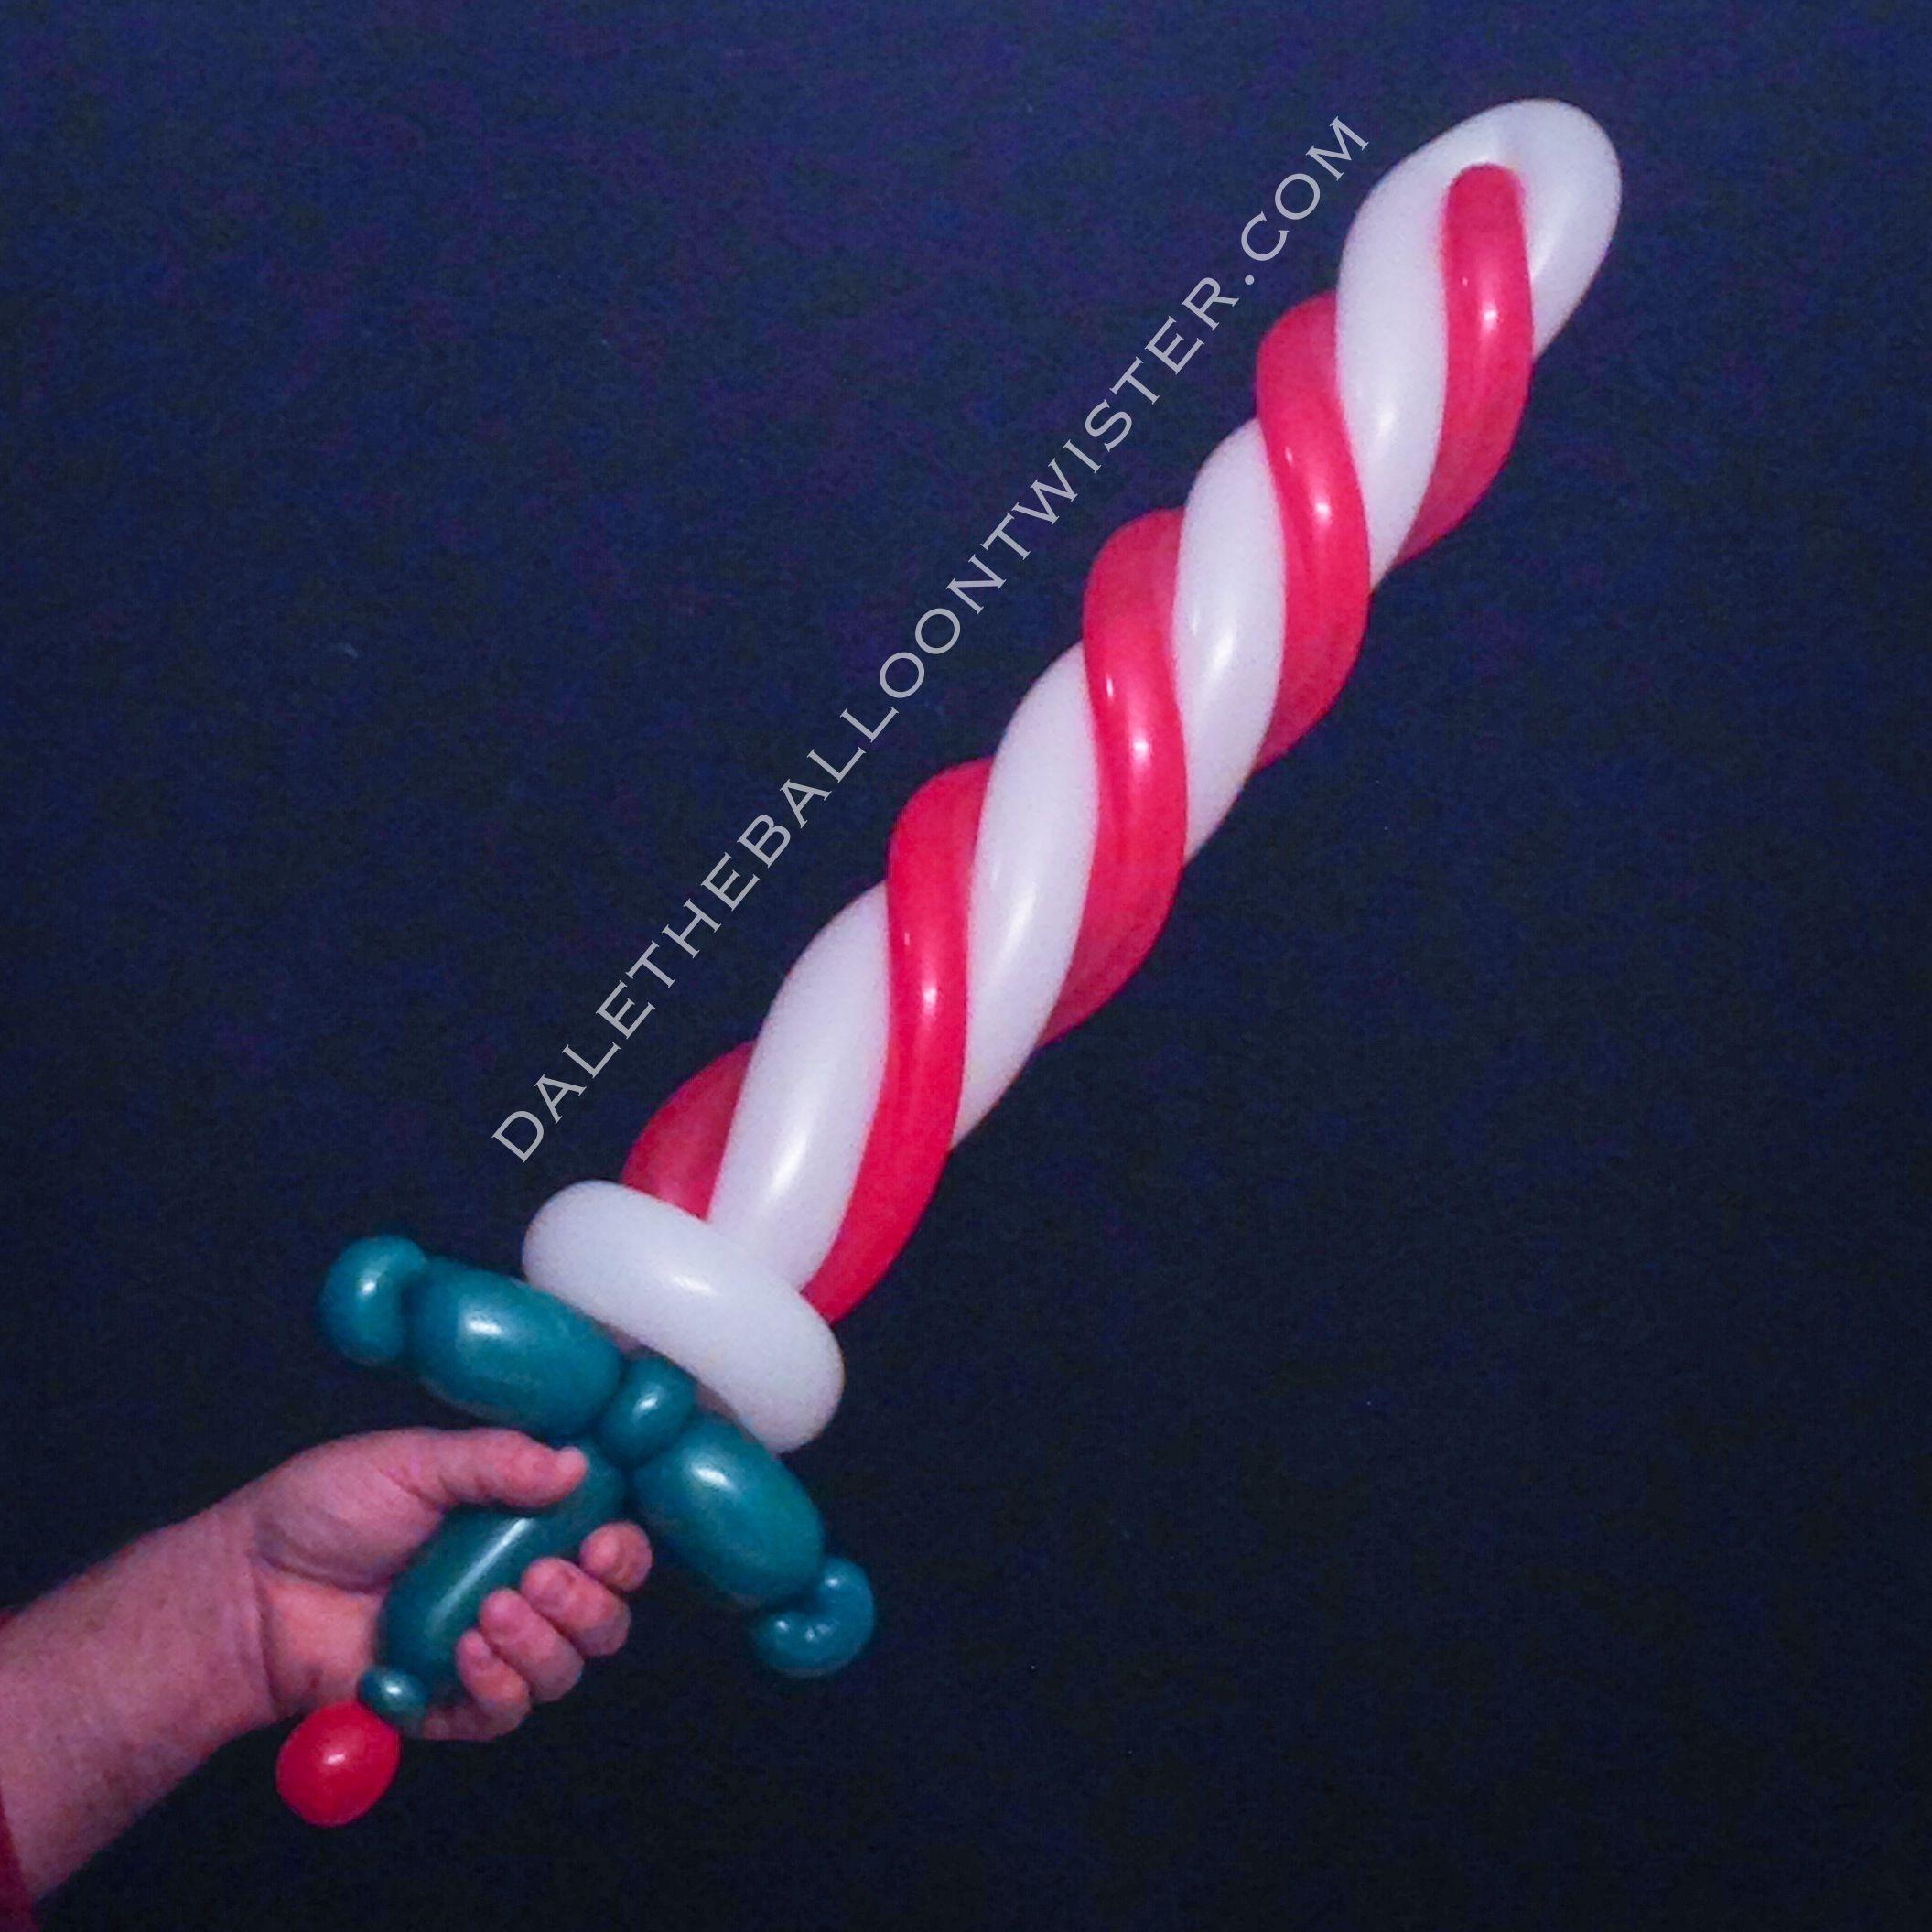 Peppermint candy balloon sword balloon sculptures for Candy cane balloon sculpture